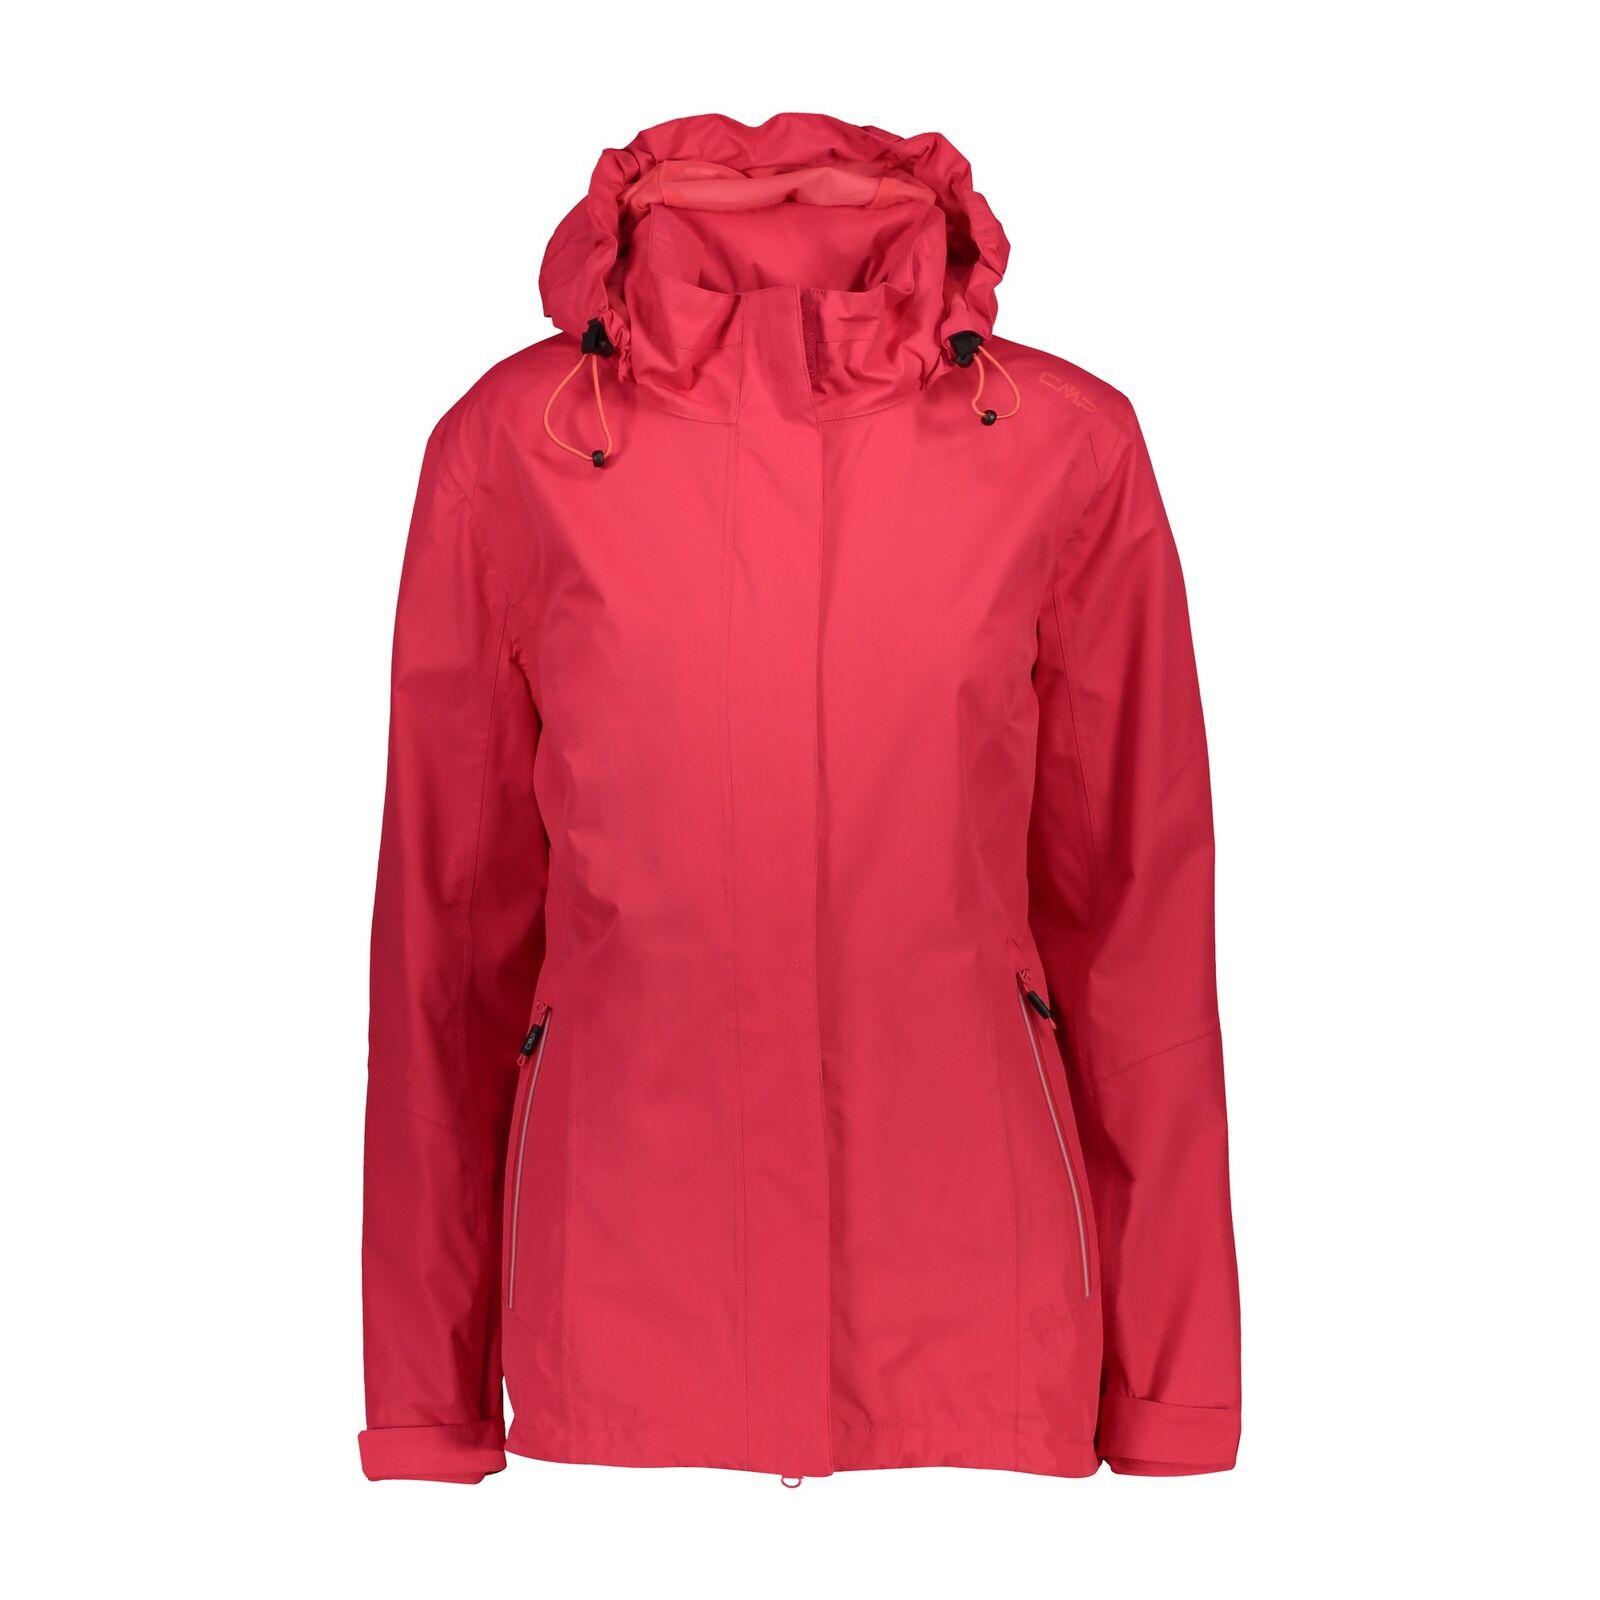 CMP Giacca Giacca donna Jacket Zip Hood Rosso Vento di tenuta impermeabile Tinta